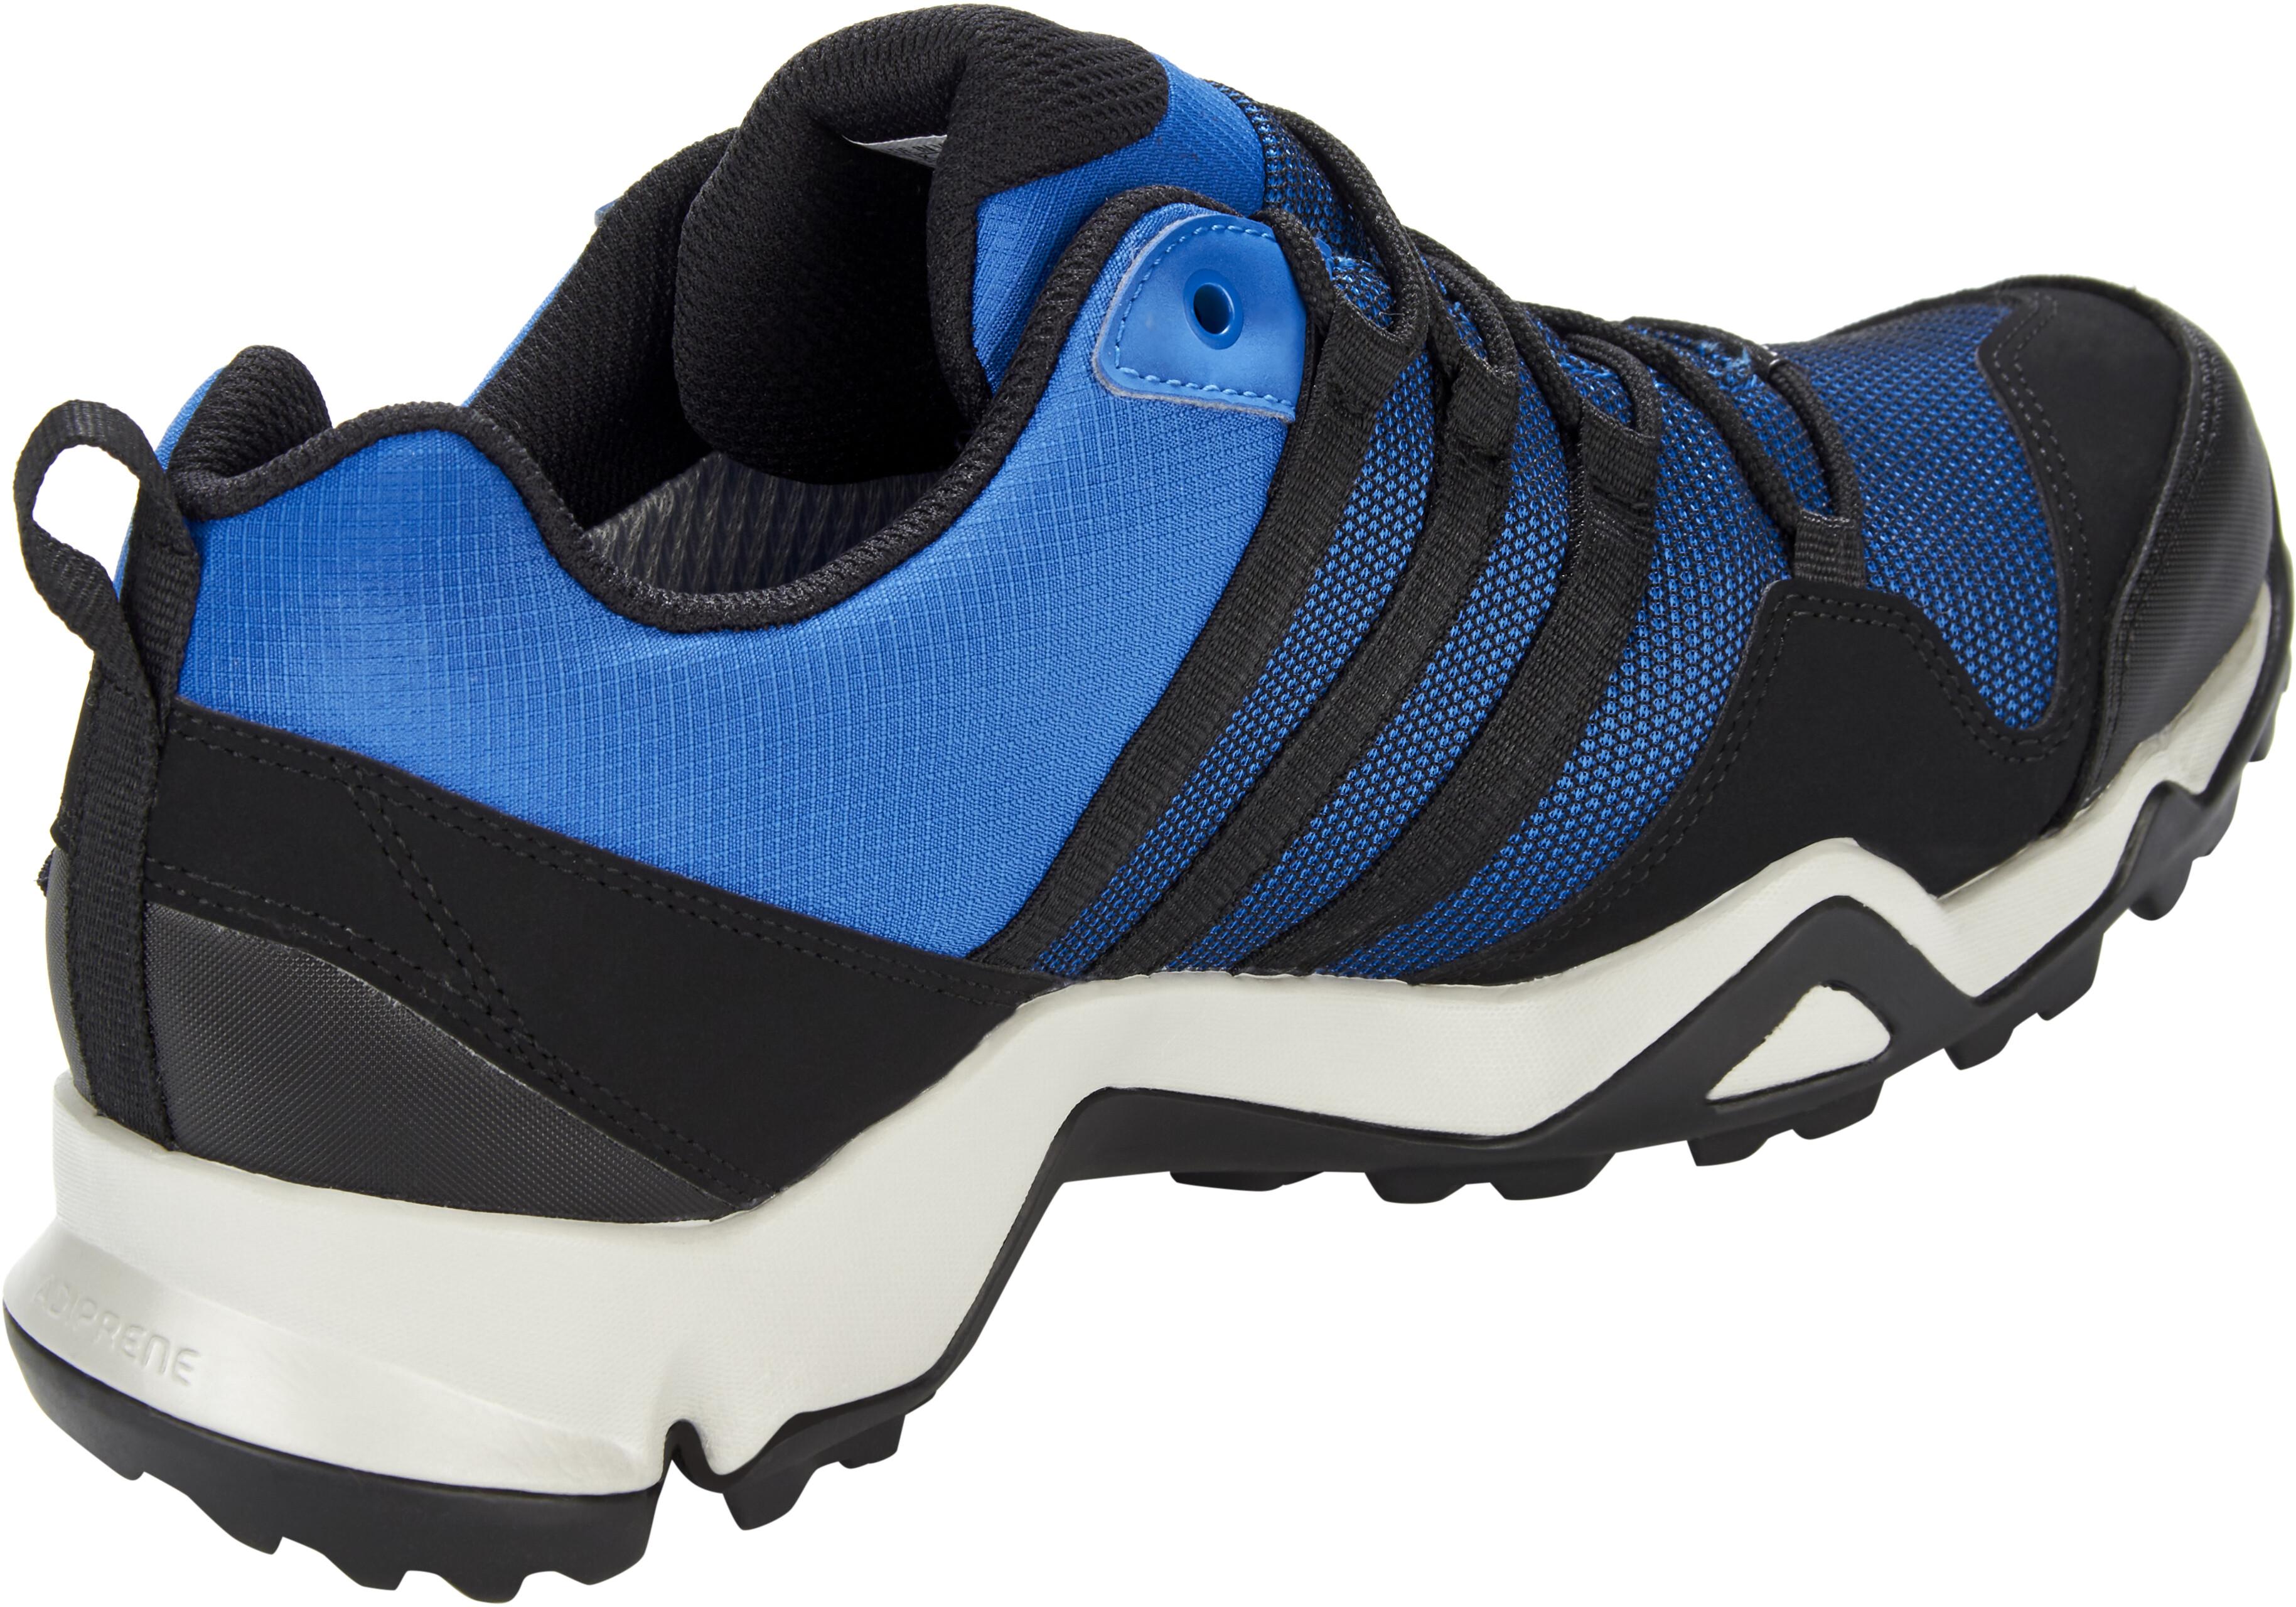 new product 961c0 6fc25 adidas TERREX AX2 CP Scarpe Uomo blu nero